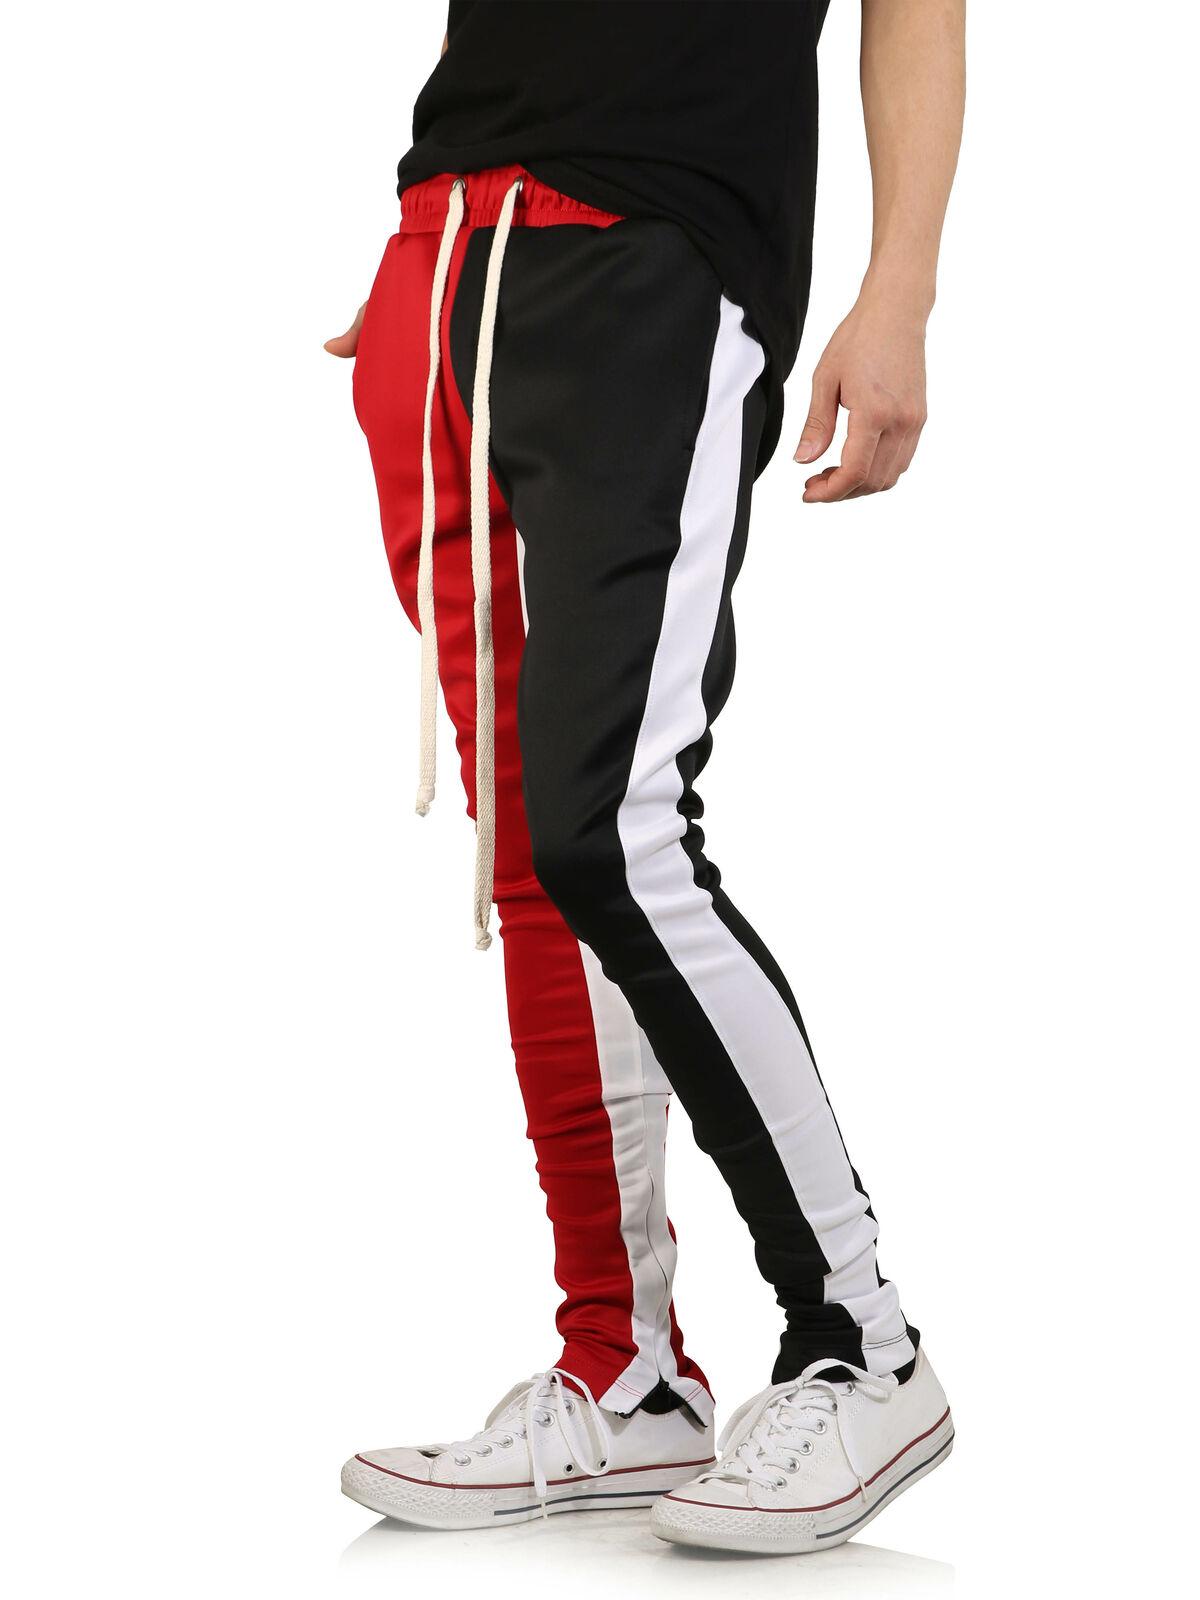 Loeay Pantalones causales para Hombres Hip Hop Streetwear Pantalones de ch/ándal de Bloque de Color Pantalones de Pana Pantalones de Patchwork de Cintura el/ástica Harem